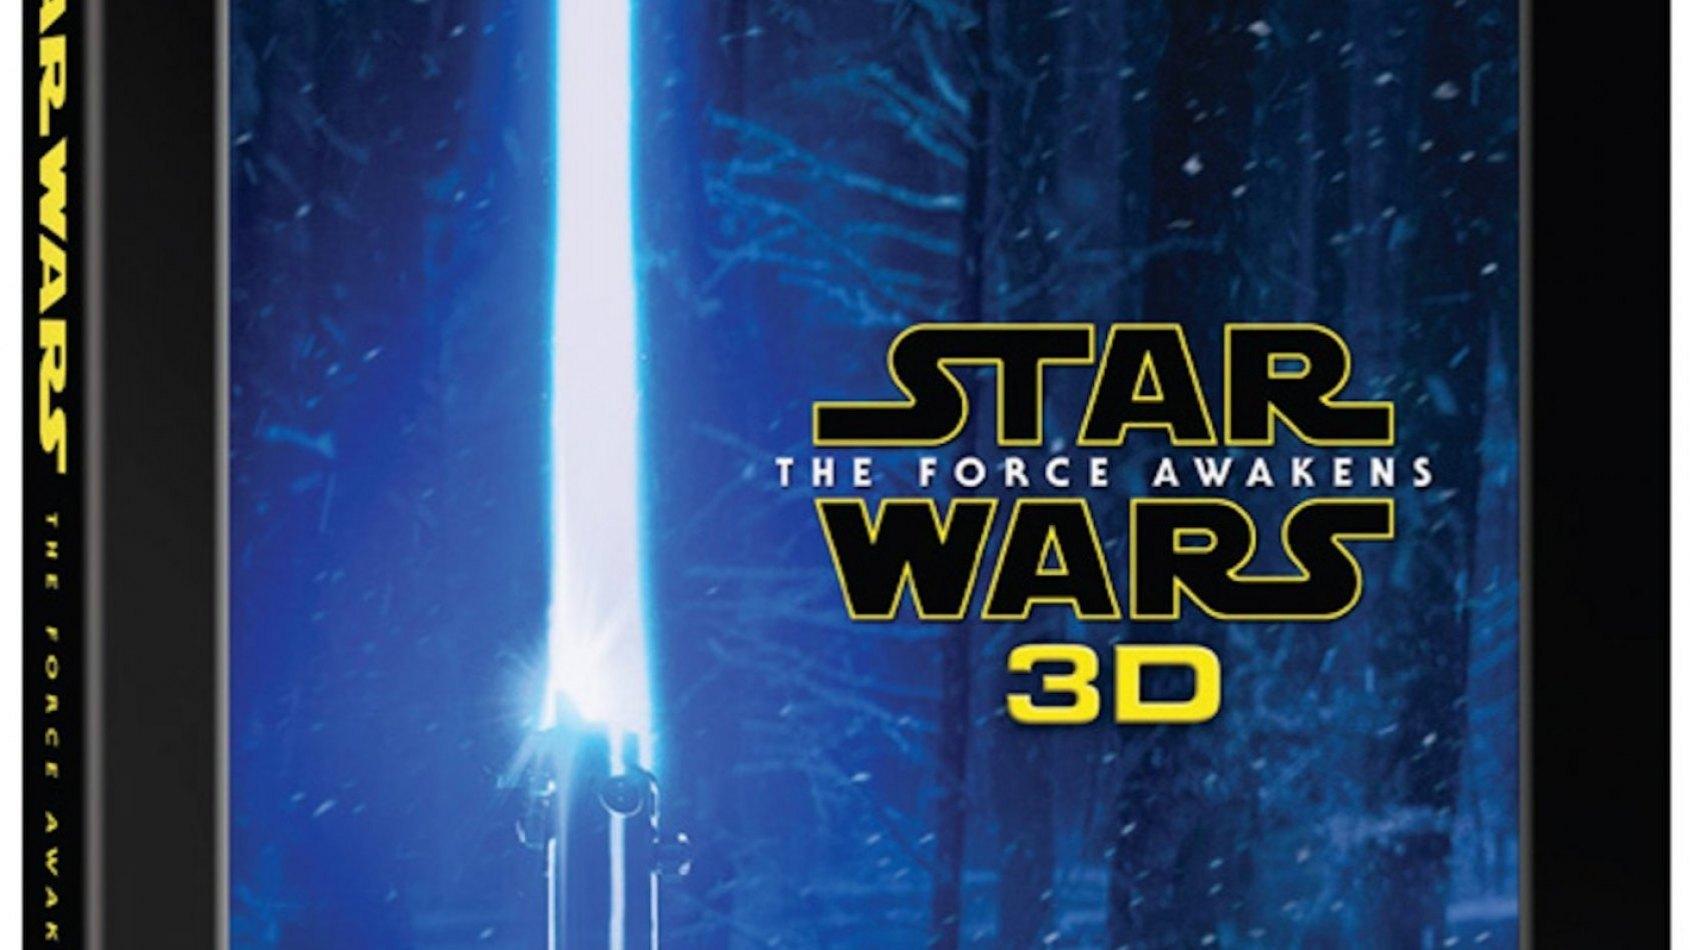 Sortie aujourd'hui du Blu-ray 3D du Réveil de la Force